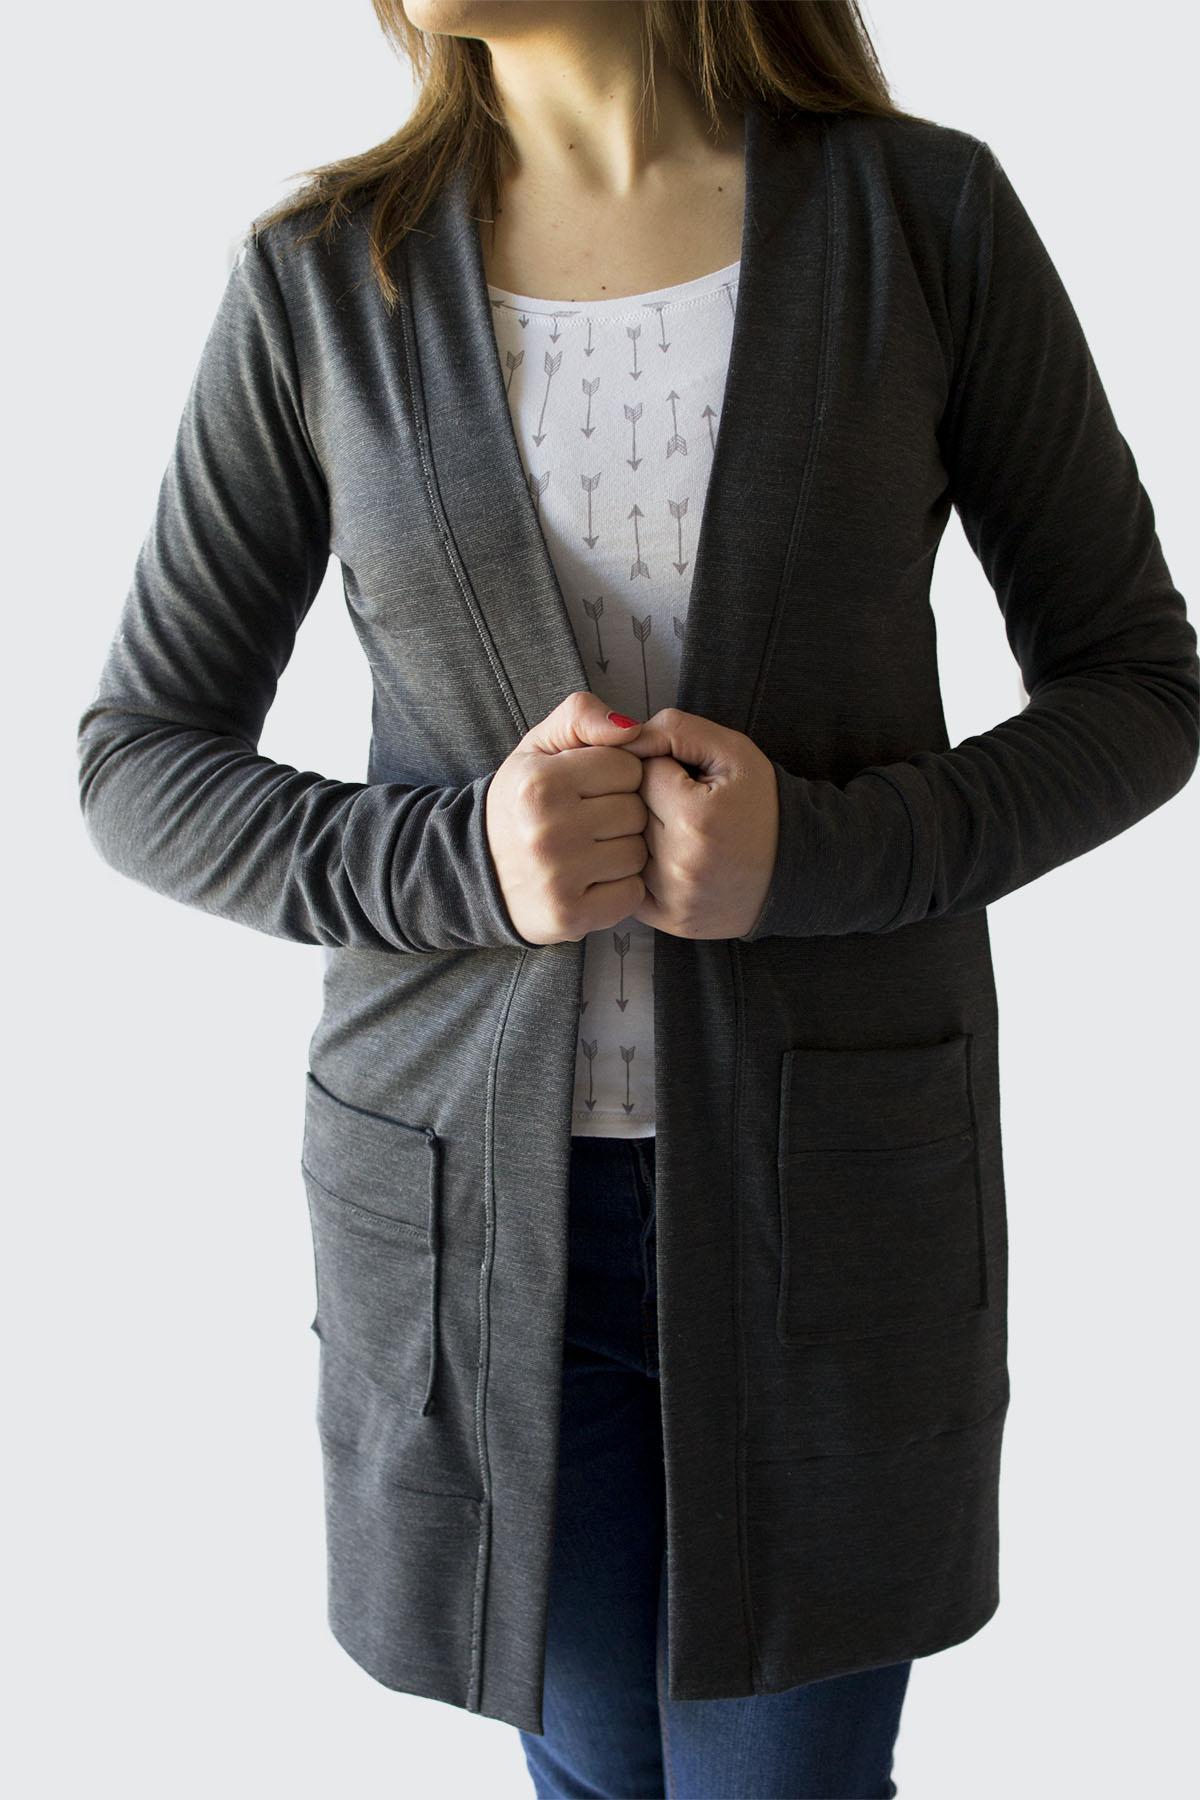 My Blackwood cardigan by Helen's closet